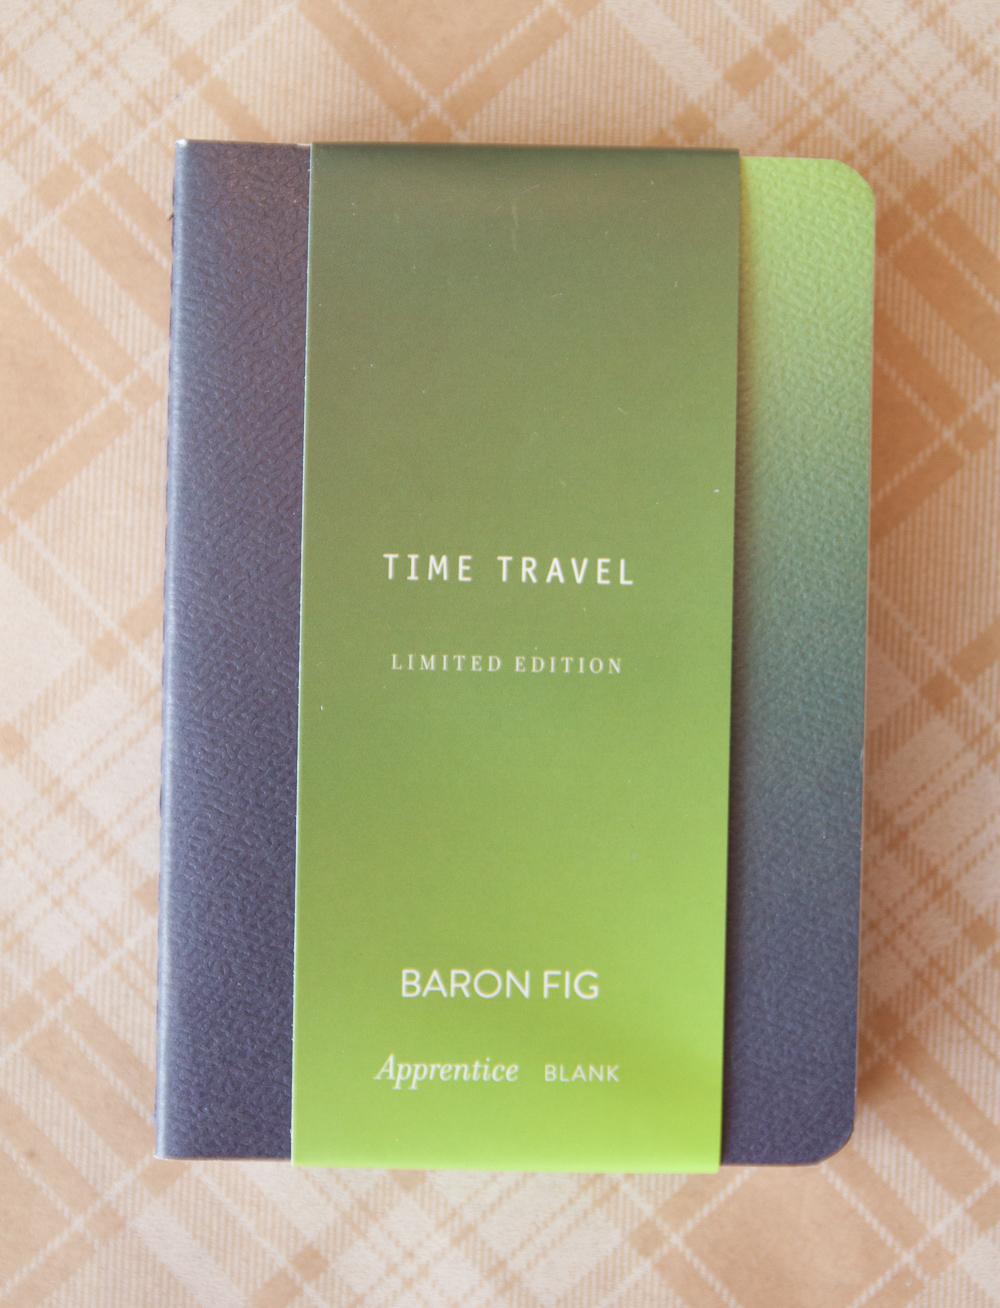 Baron Fig Apprentice Time Travel Edition